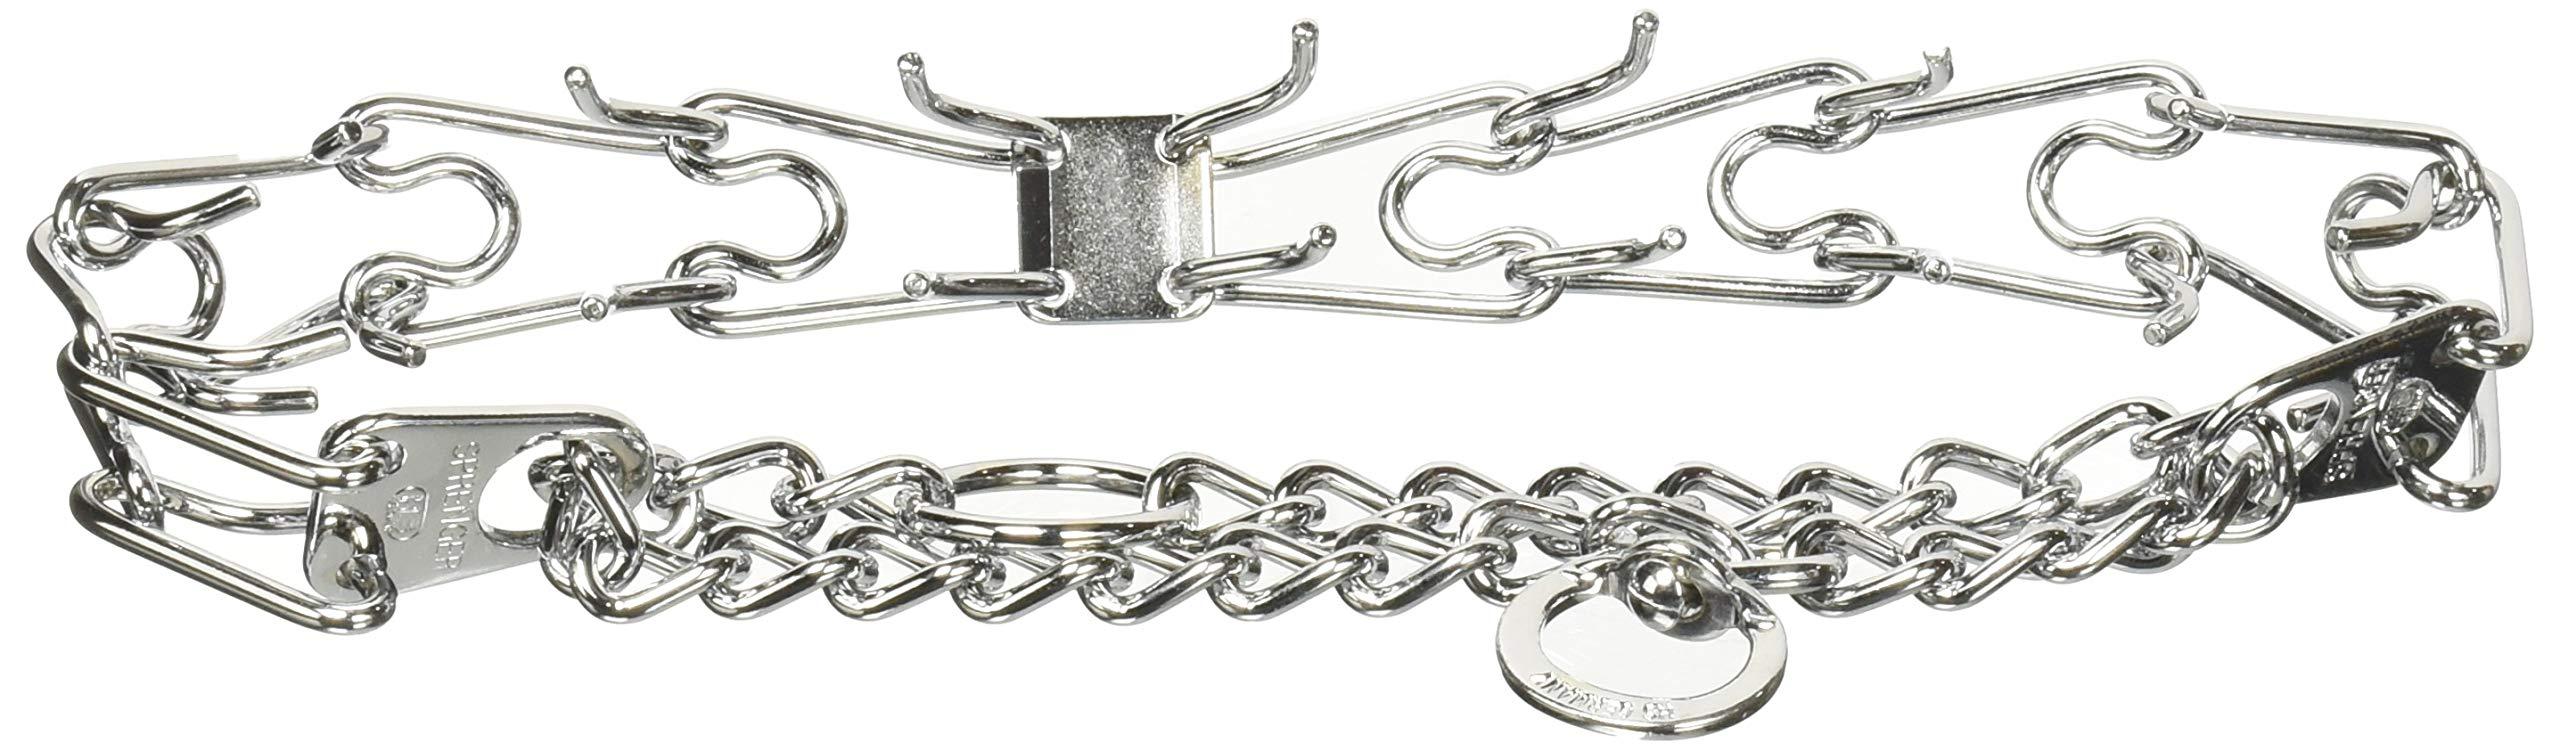 Herm-SPRENGER-Ultra-Plus-Prong-Dog-Training-Collar-30-mm-x-18-Steel-Chrome-Plated-Dog-Prong-Collar-Pinch-Collar-for-Dogs-Dog-Correction-Collar-Dog-Prong-Training-Collar-Dog-Supplies